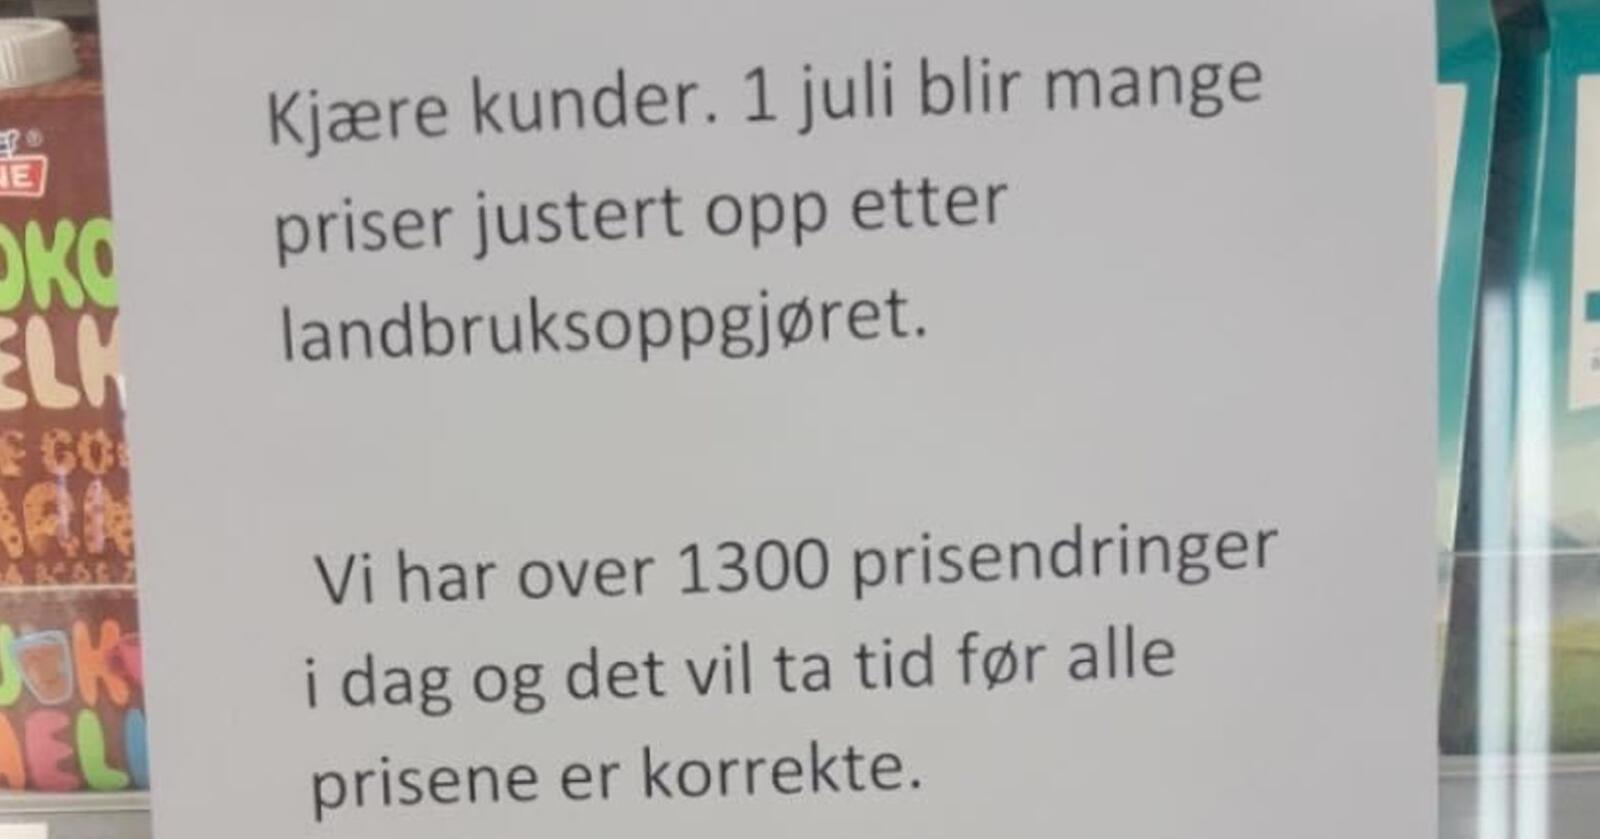 Denne plakaten var hengt opp på en Coop-butikk. Foto: Sigrid Hjørnegård/Facebook